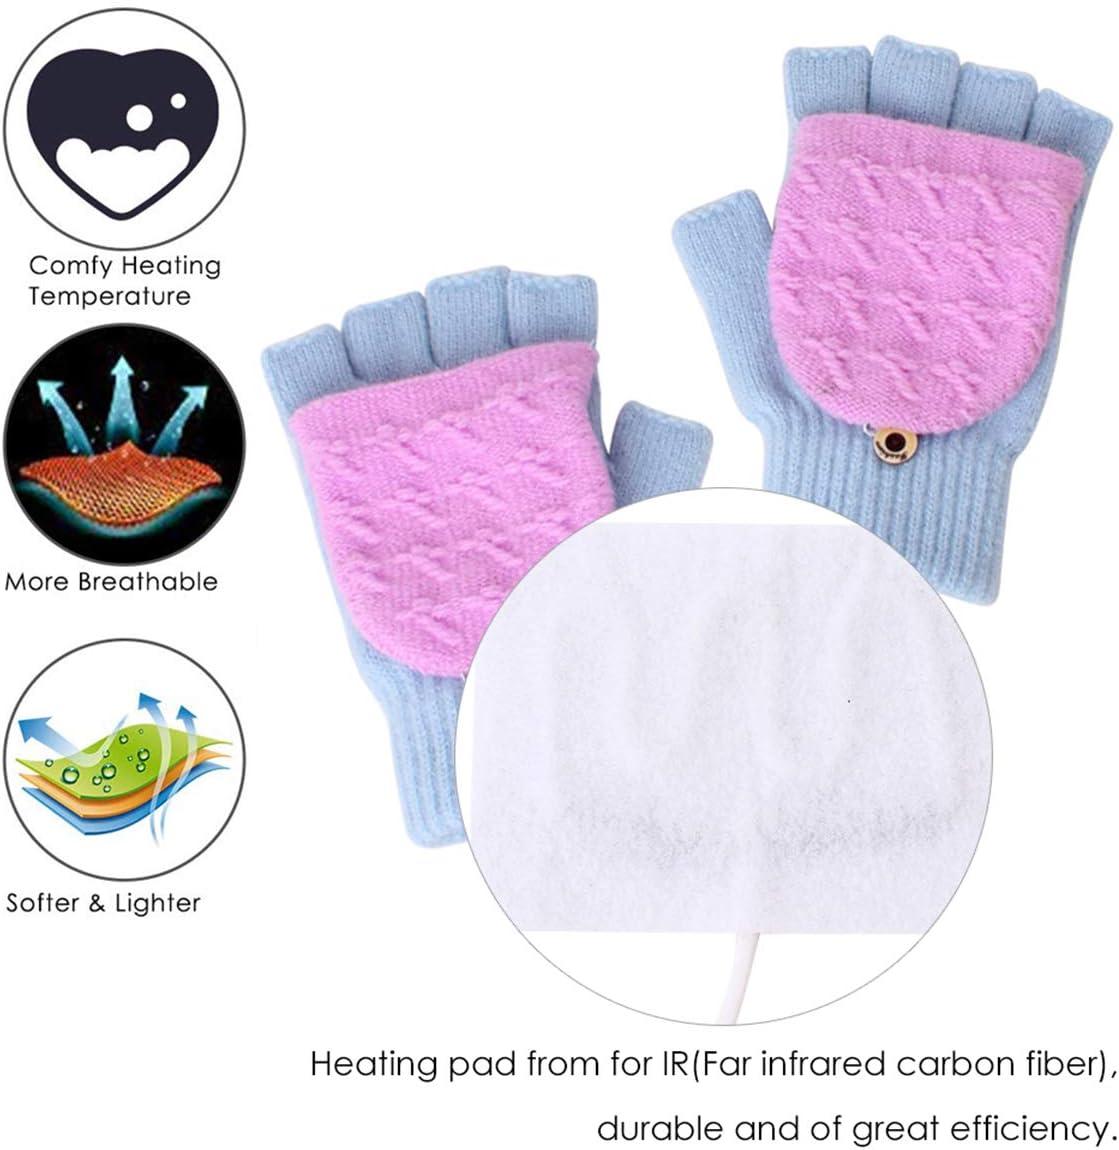 Petyoung Unisex USB Heated Gloves Winter Full /& Half Fingers Warmer Laptop Gloves Mittens for Women Men Girls Boys Best Winter Gift Choice Light Gray + Purple